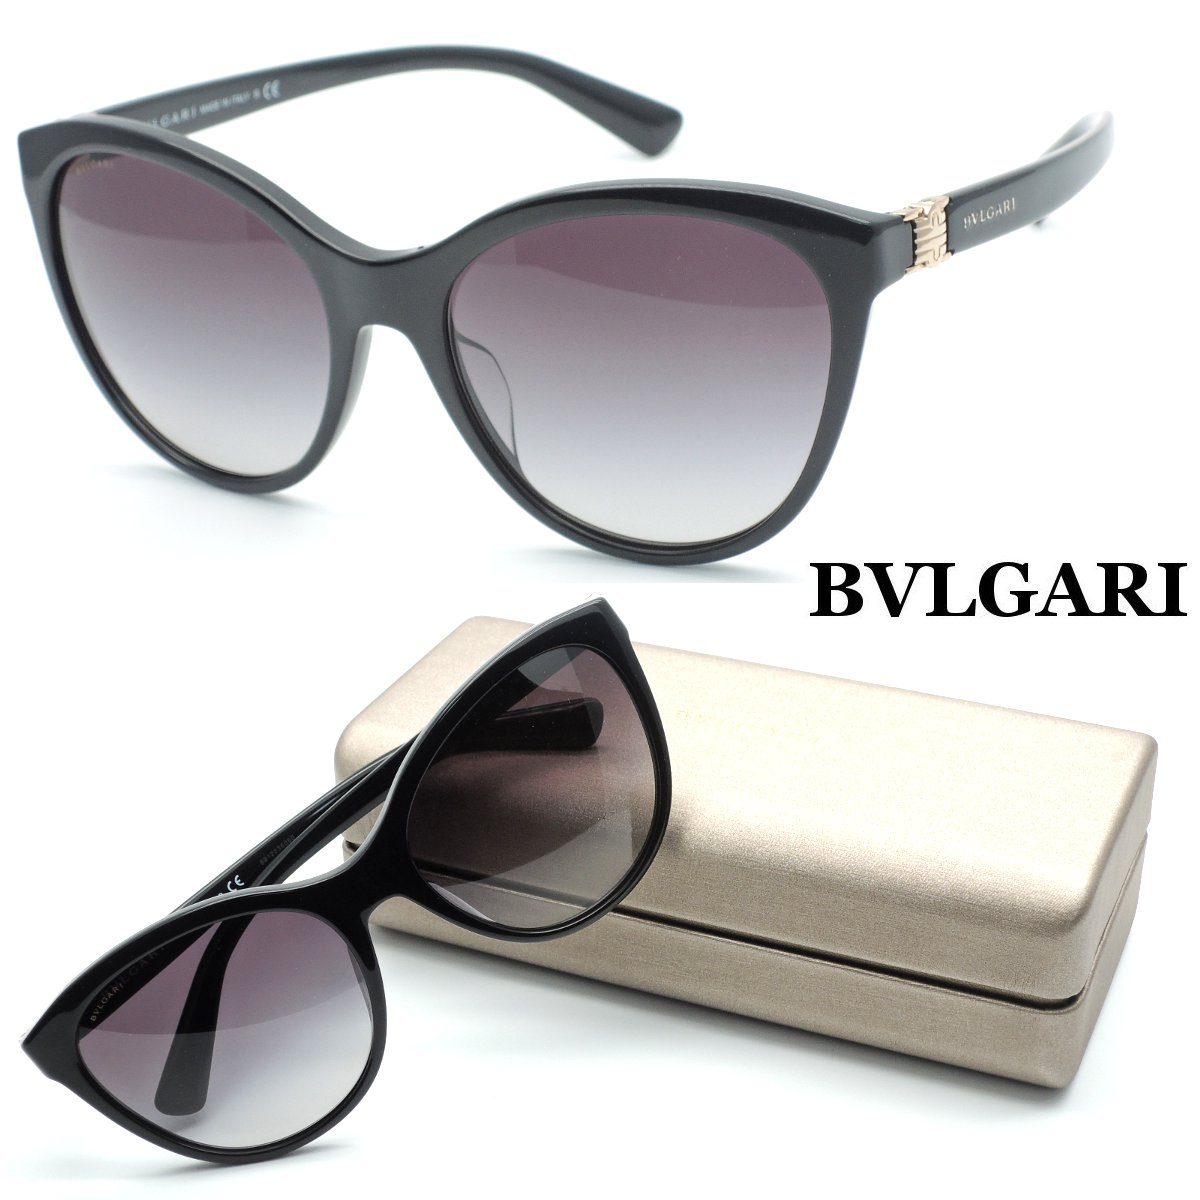 【BVLGARI】 ブルガリ サングラス BV8197-F col.501/8G【正規代理店商品】【店内全品送料無料】